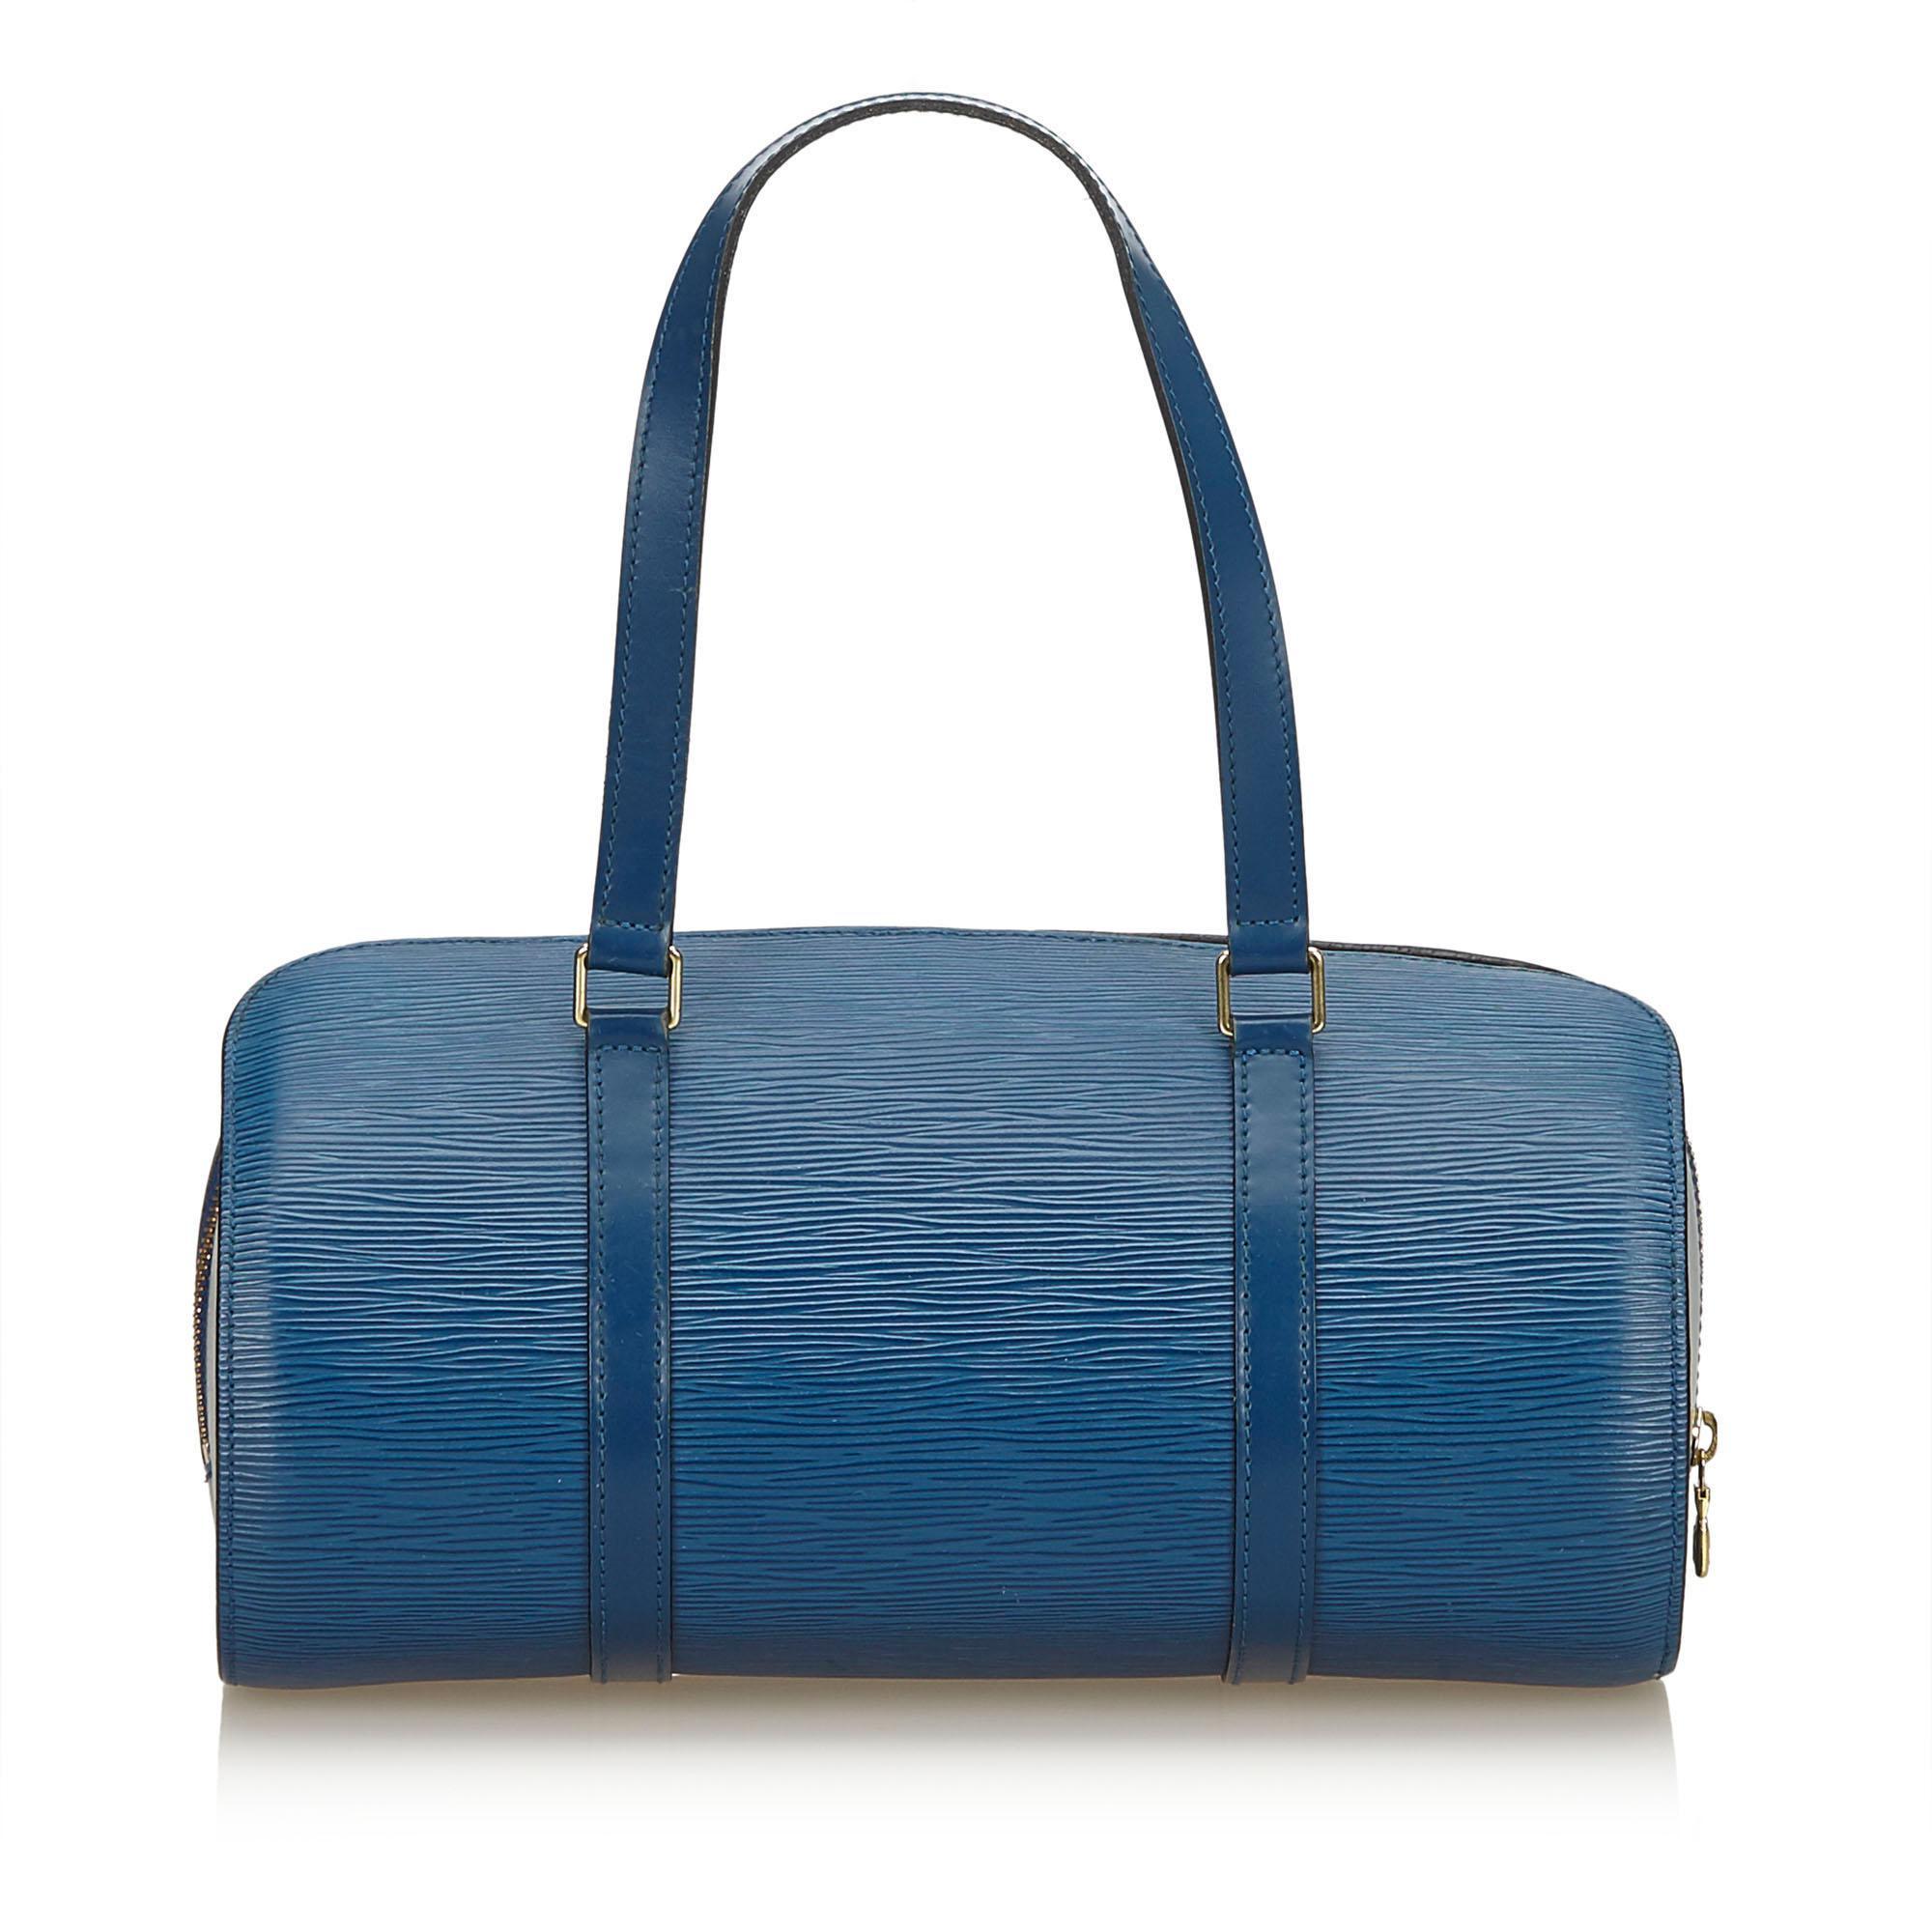 134d801e5ae Lyst - Louis Vuitton Epi Soufflot in Blue